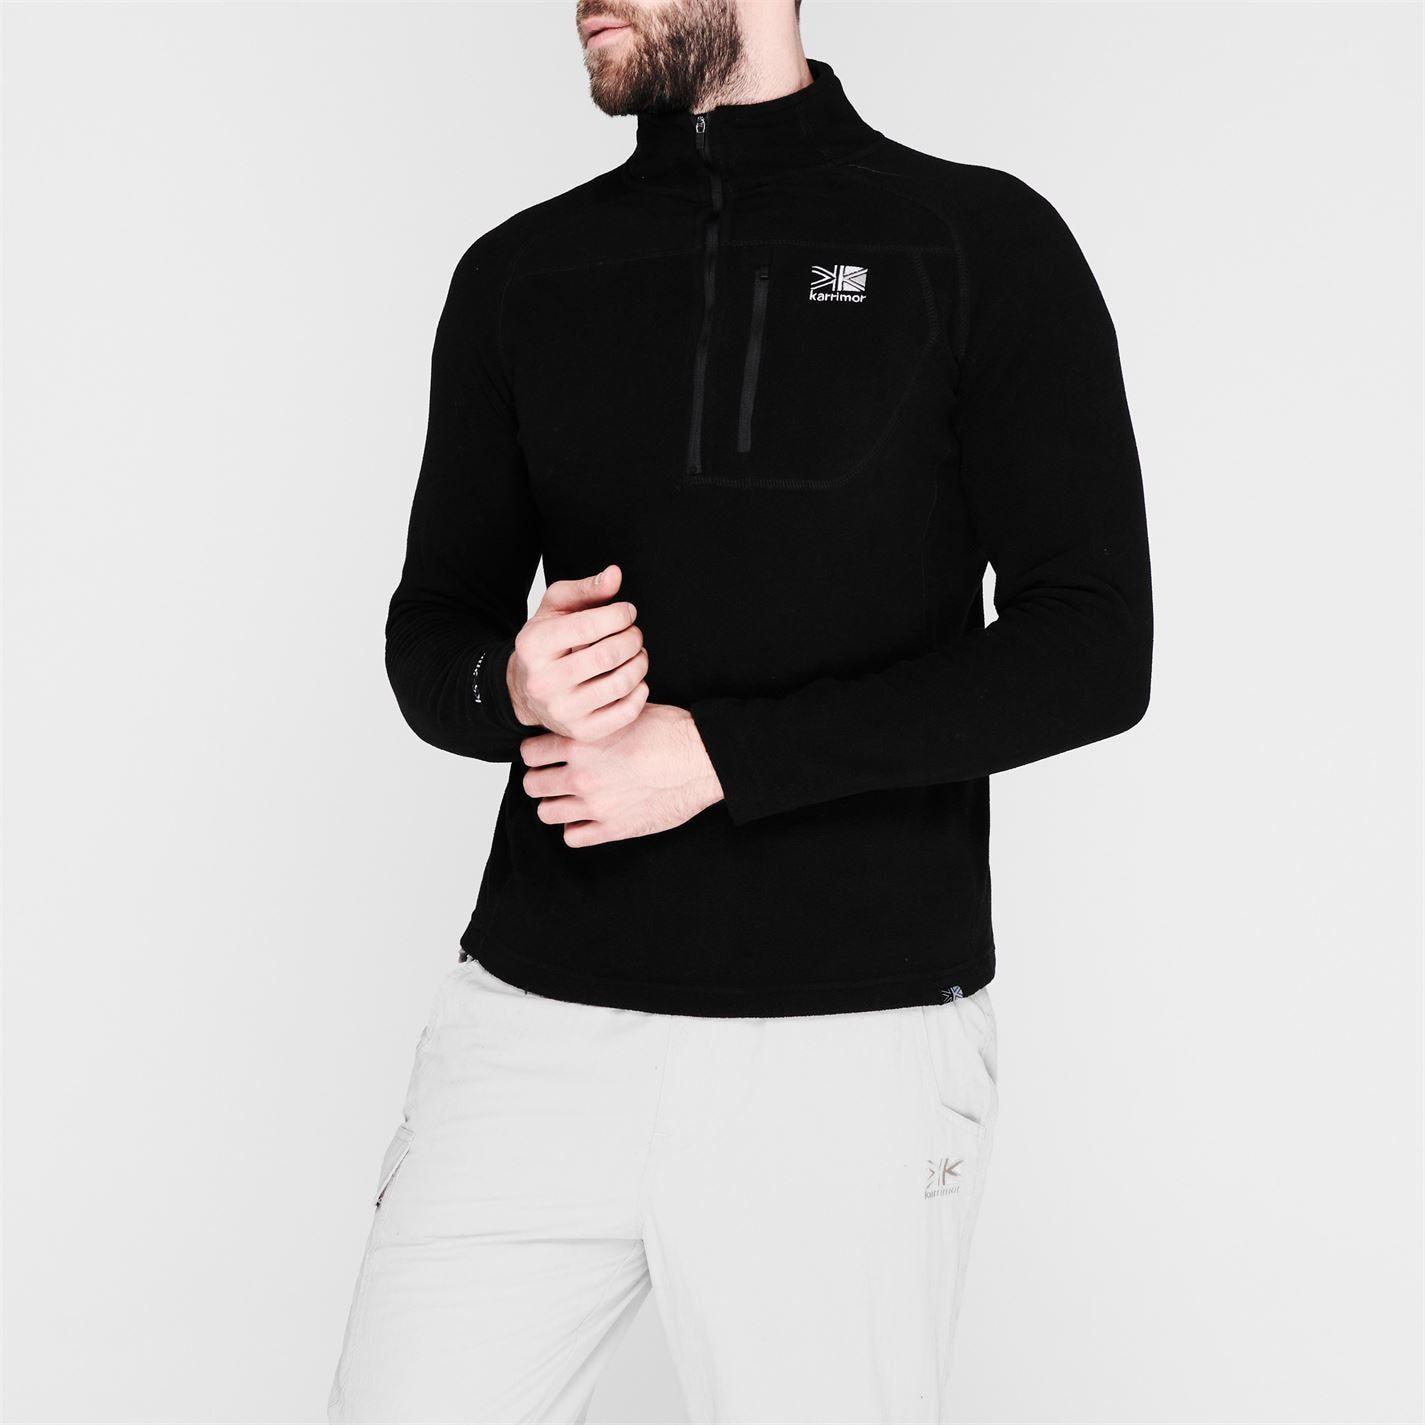 Karrimor Mens Microfleece Pullover Warm Winter Sportswear Activewear Collared